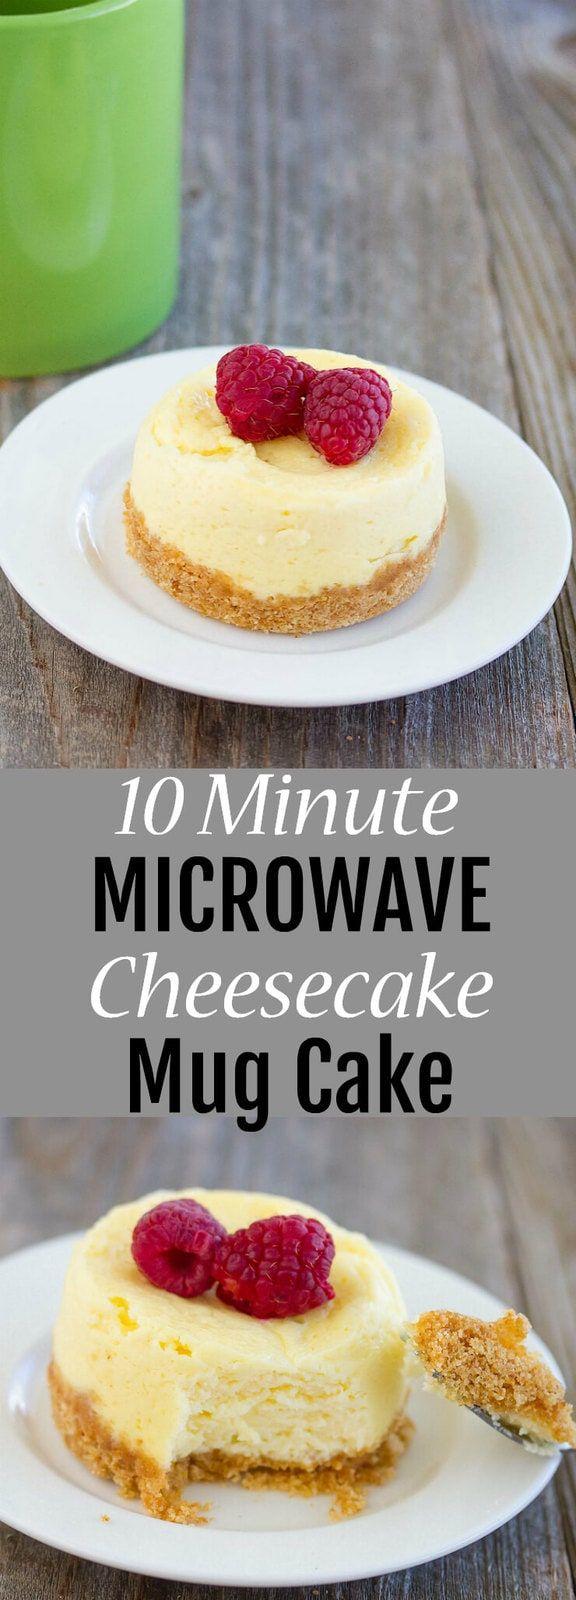 Microwave Cheesecake Mug Cake | Recipe | Mug recipes ...